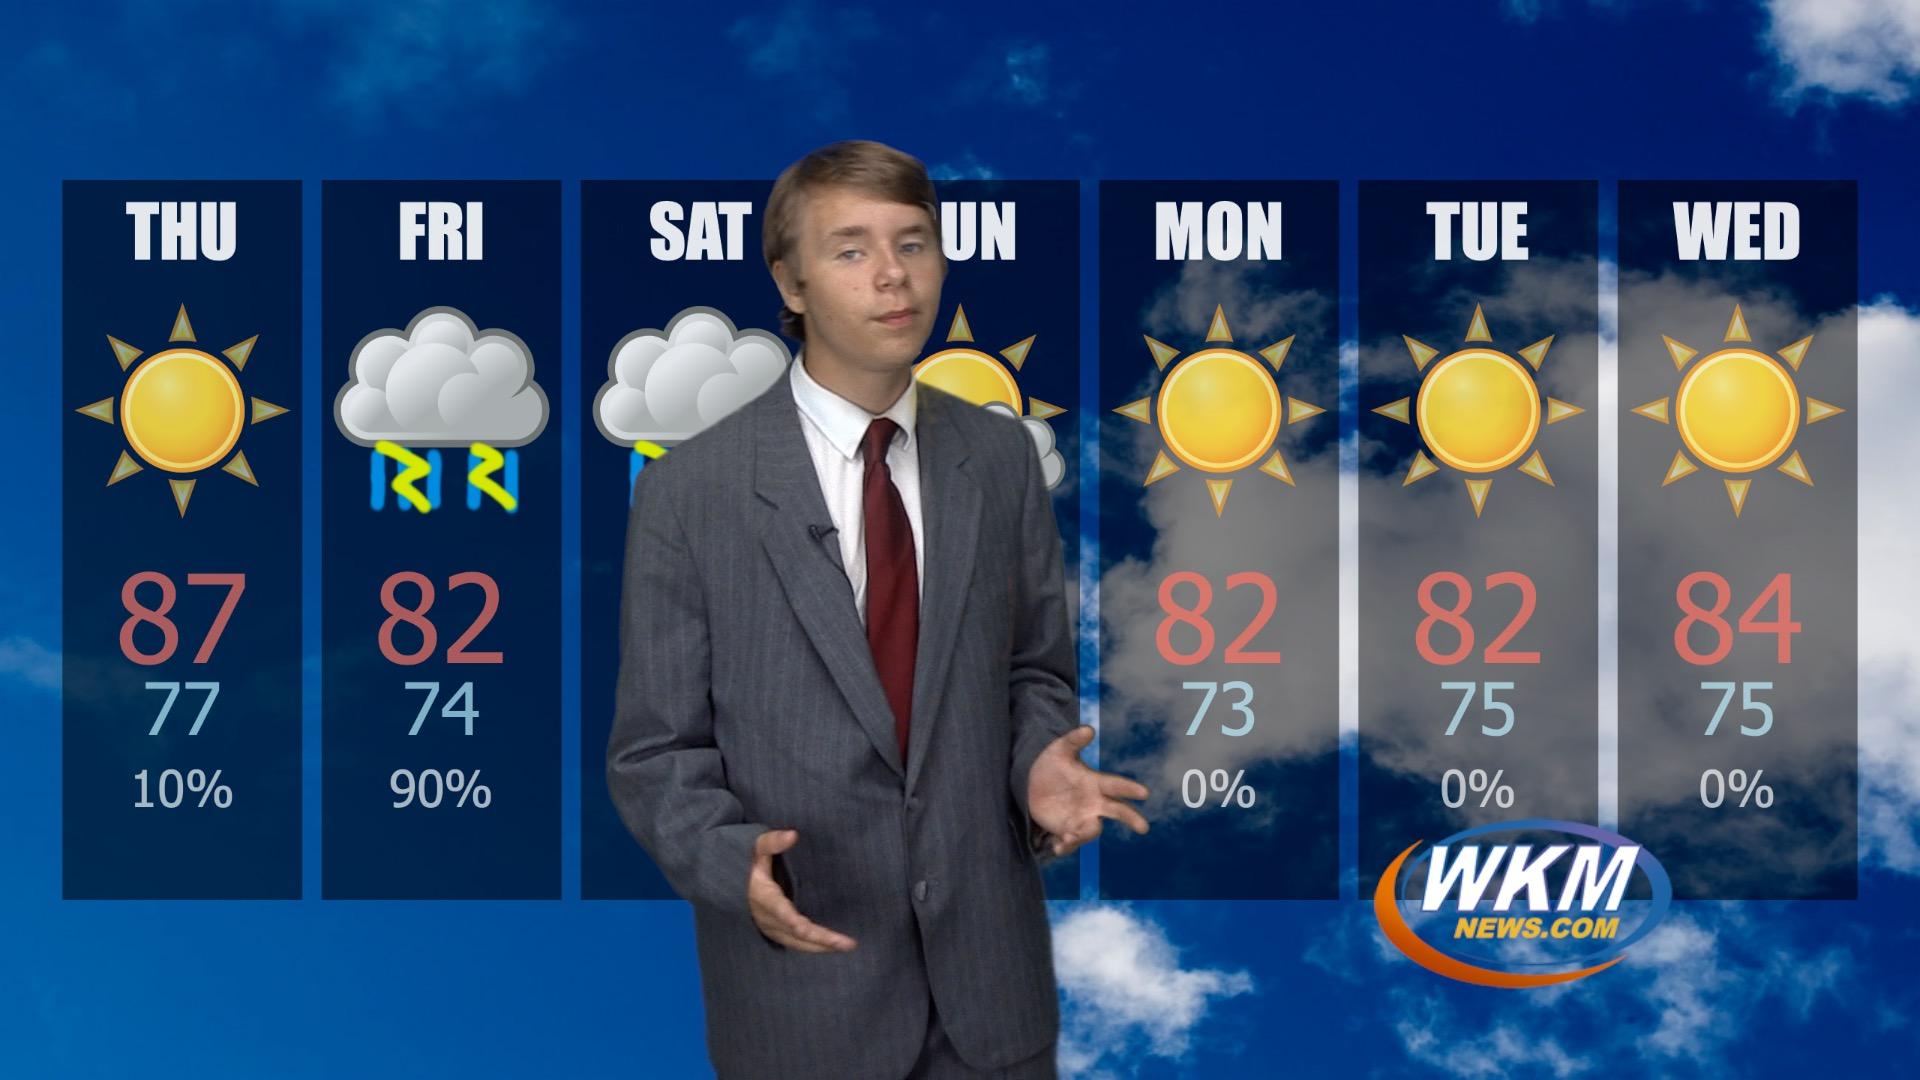 Sunny Skies Ahead: Weekly Forecast 7/15 – 7/22